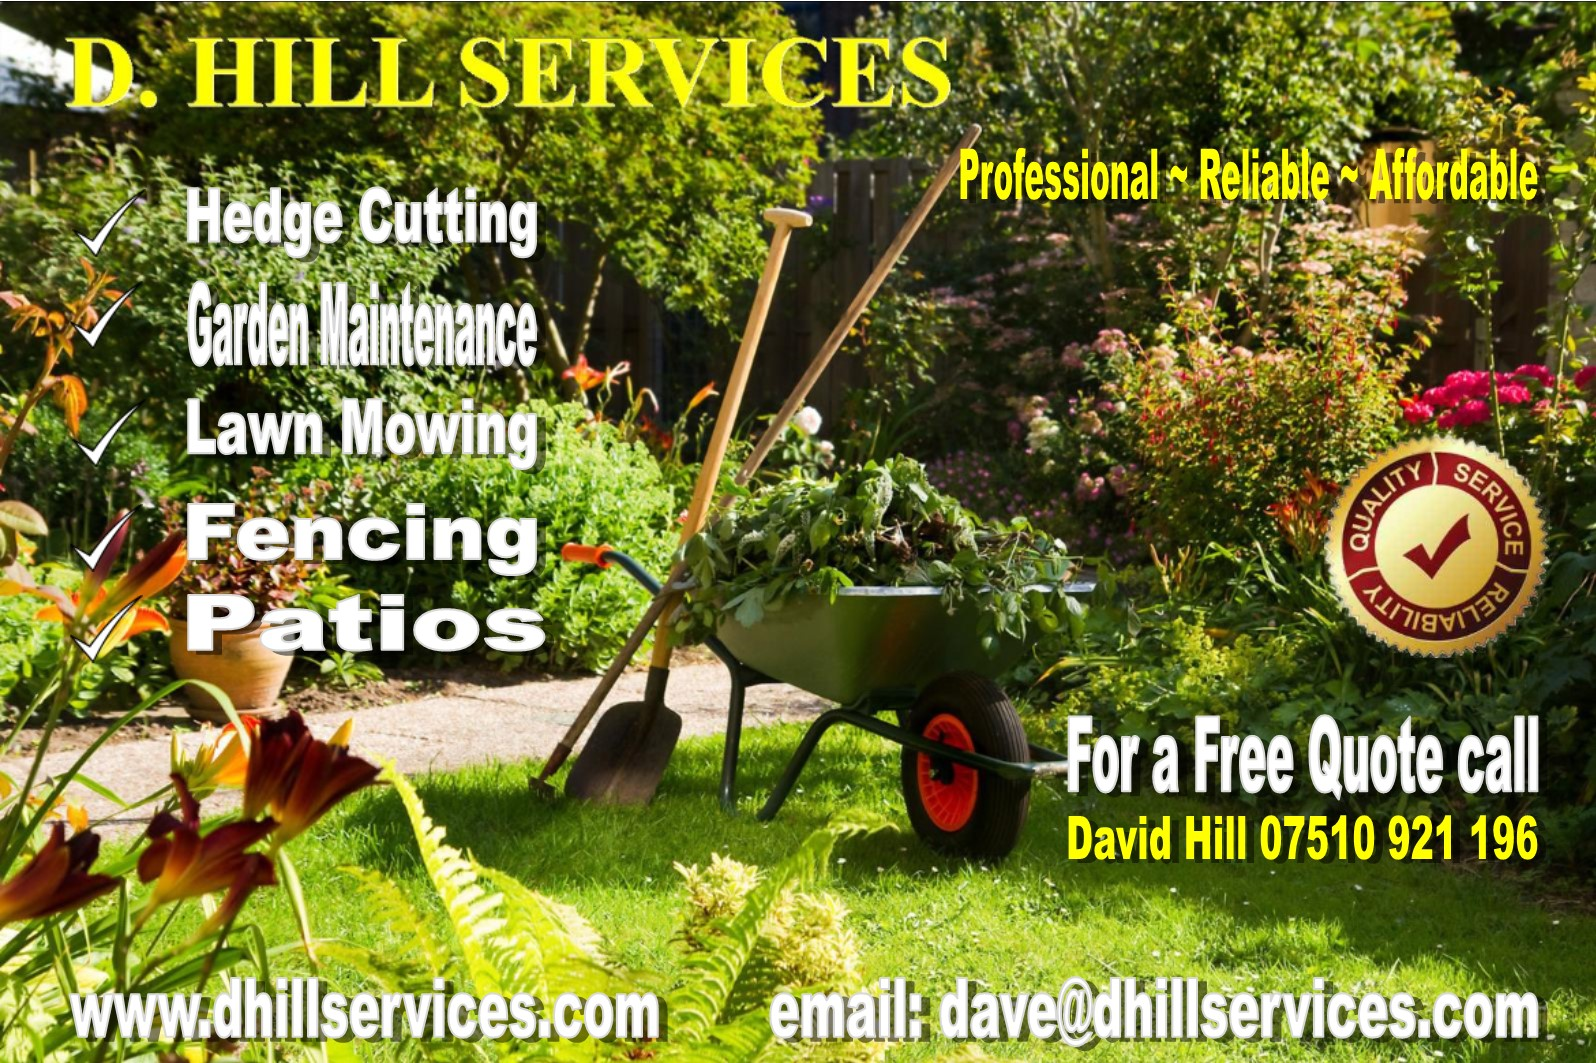 D Hill Services